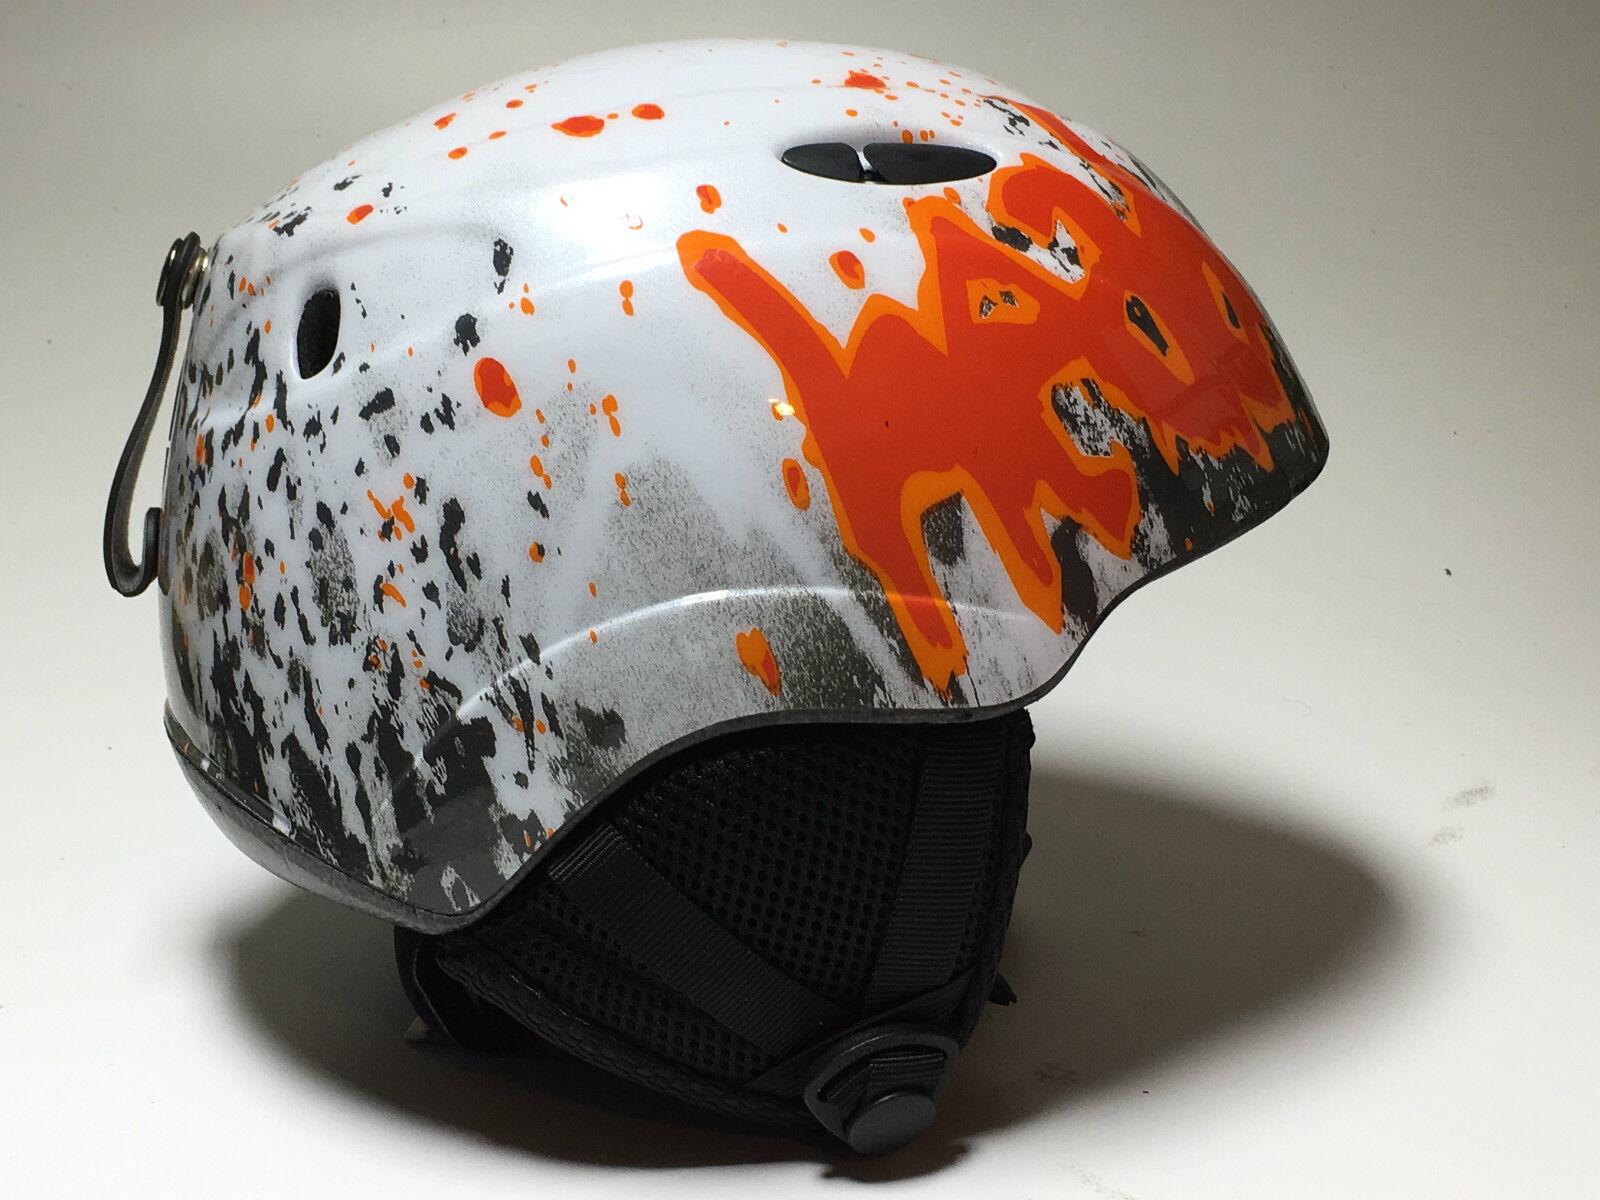 Head Kinder Ski Helm Kinderskihelm HEAD Joker Gr. XS 51 - 52 cm verstellbar cool